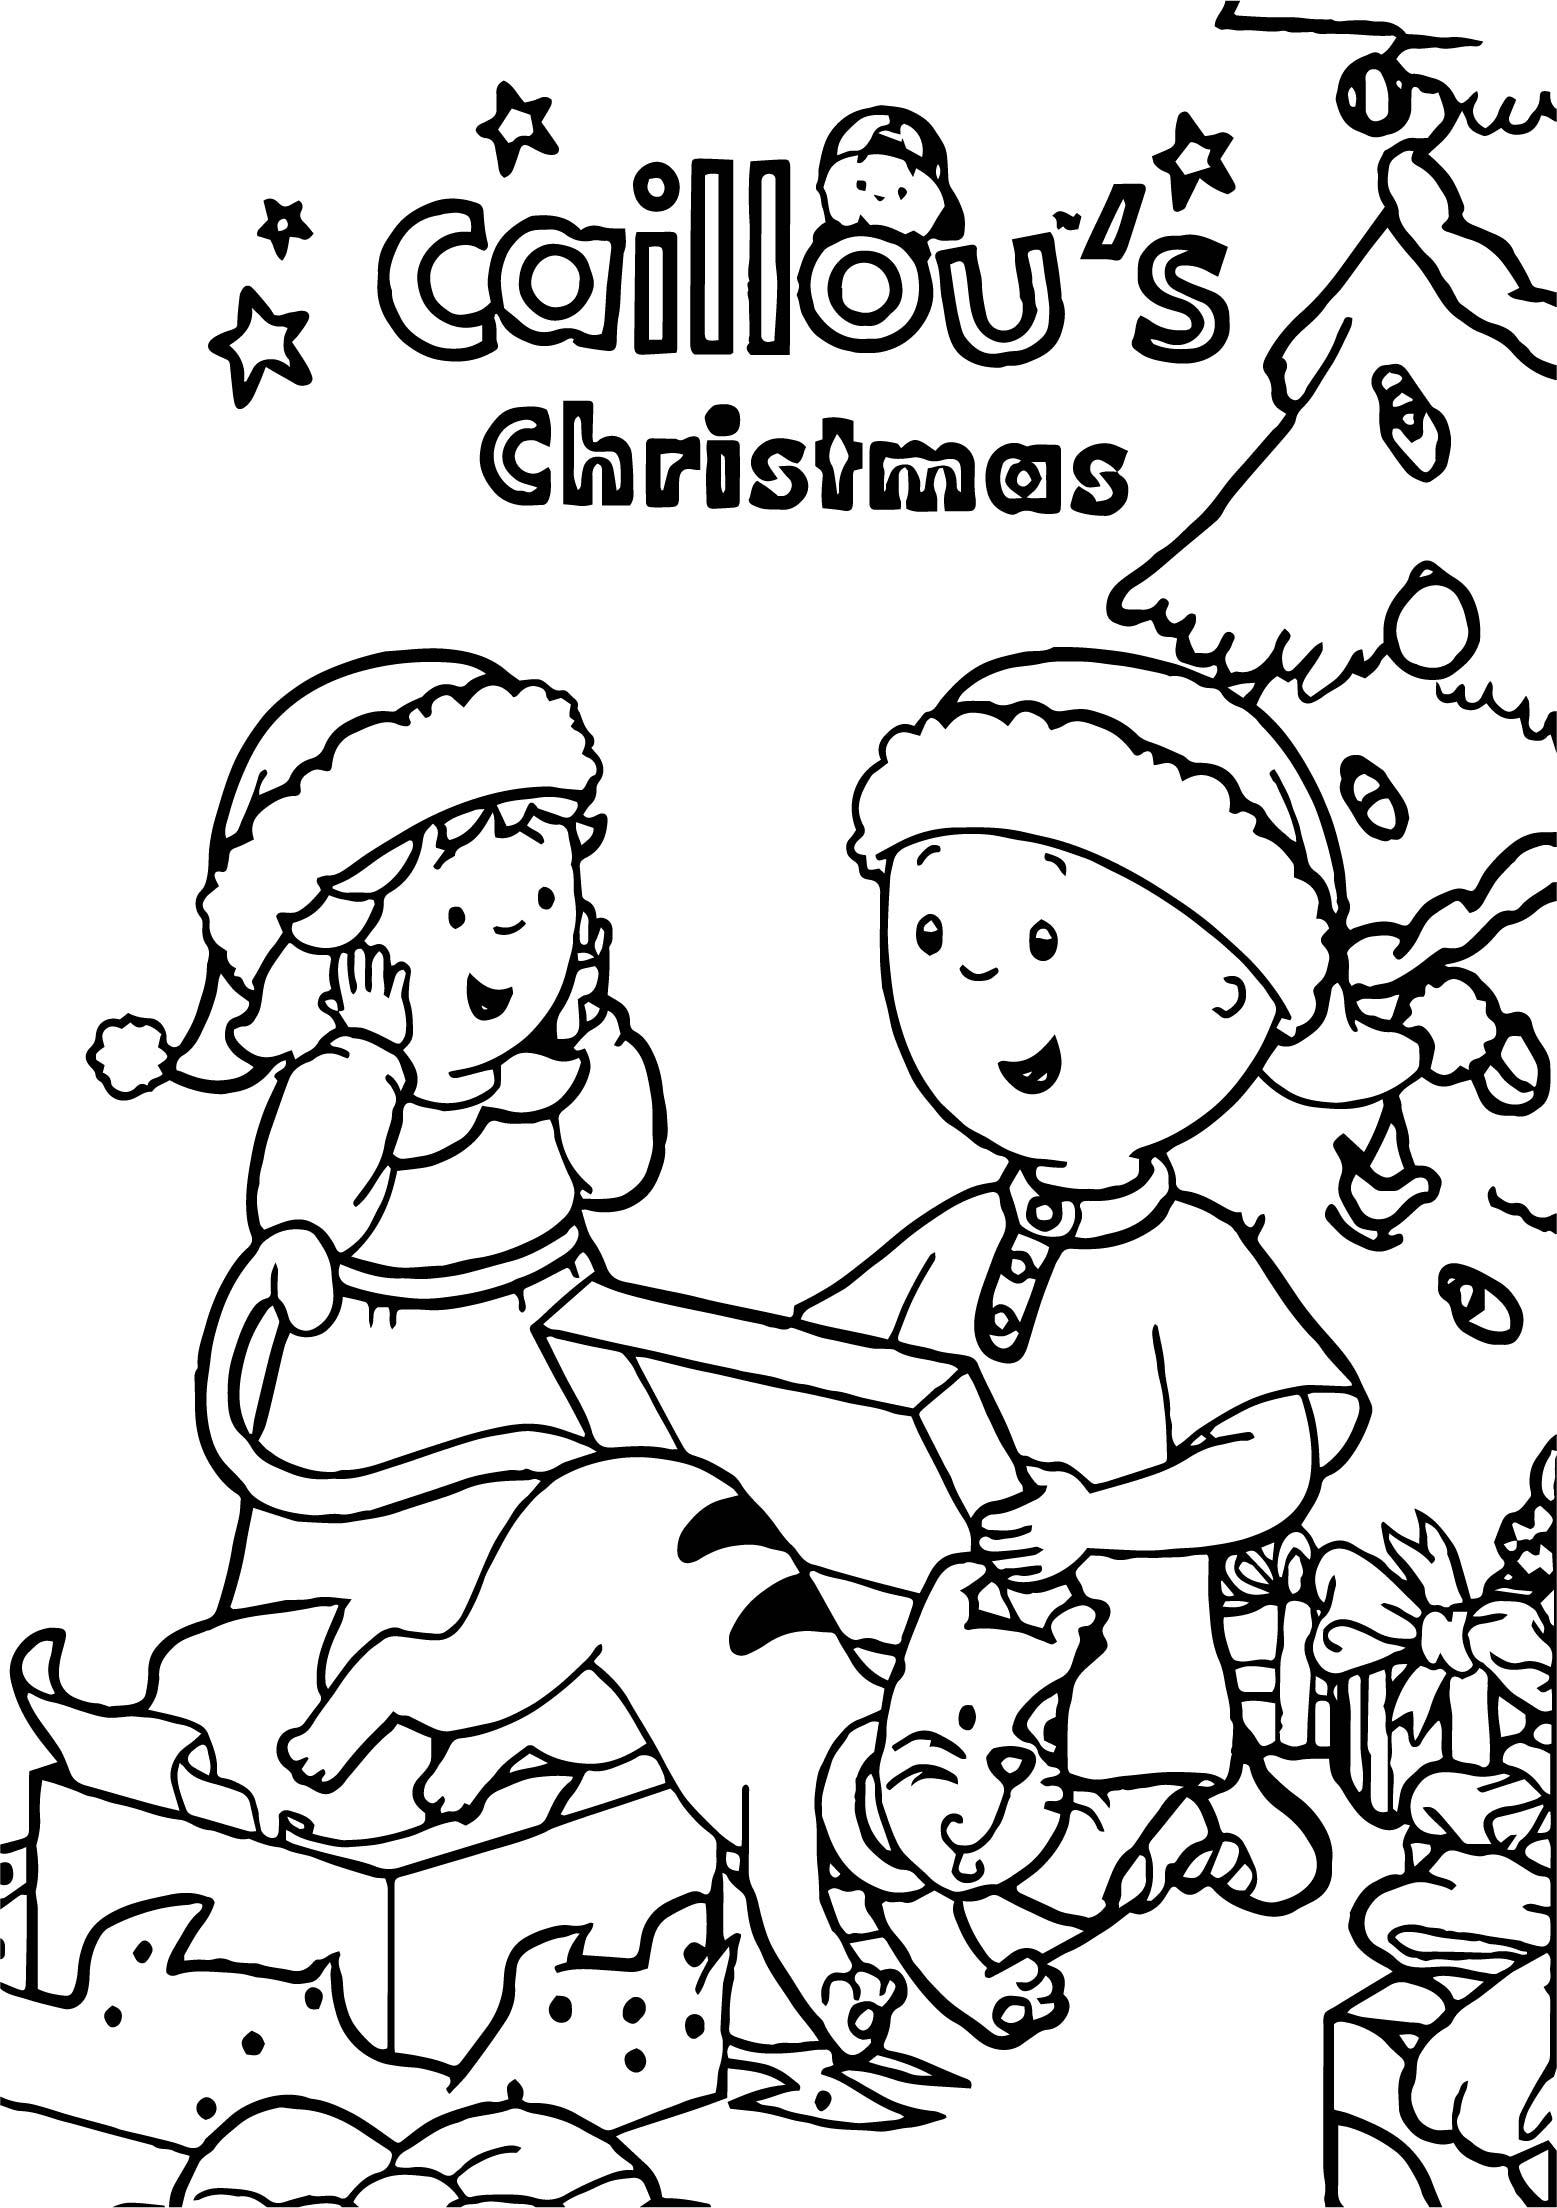 Caillou Sister Chrismas T Coloring Page